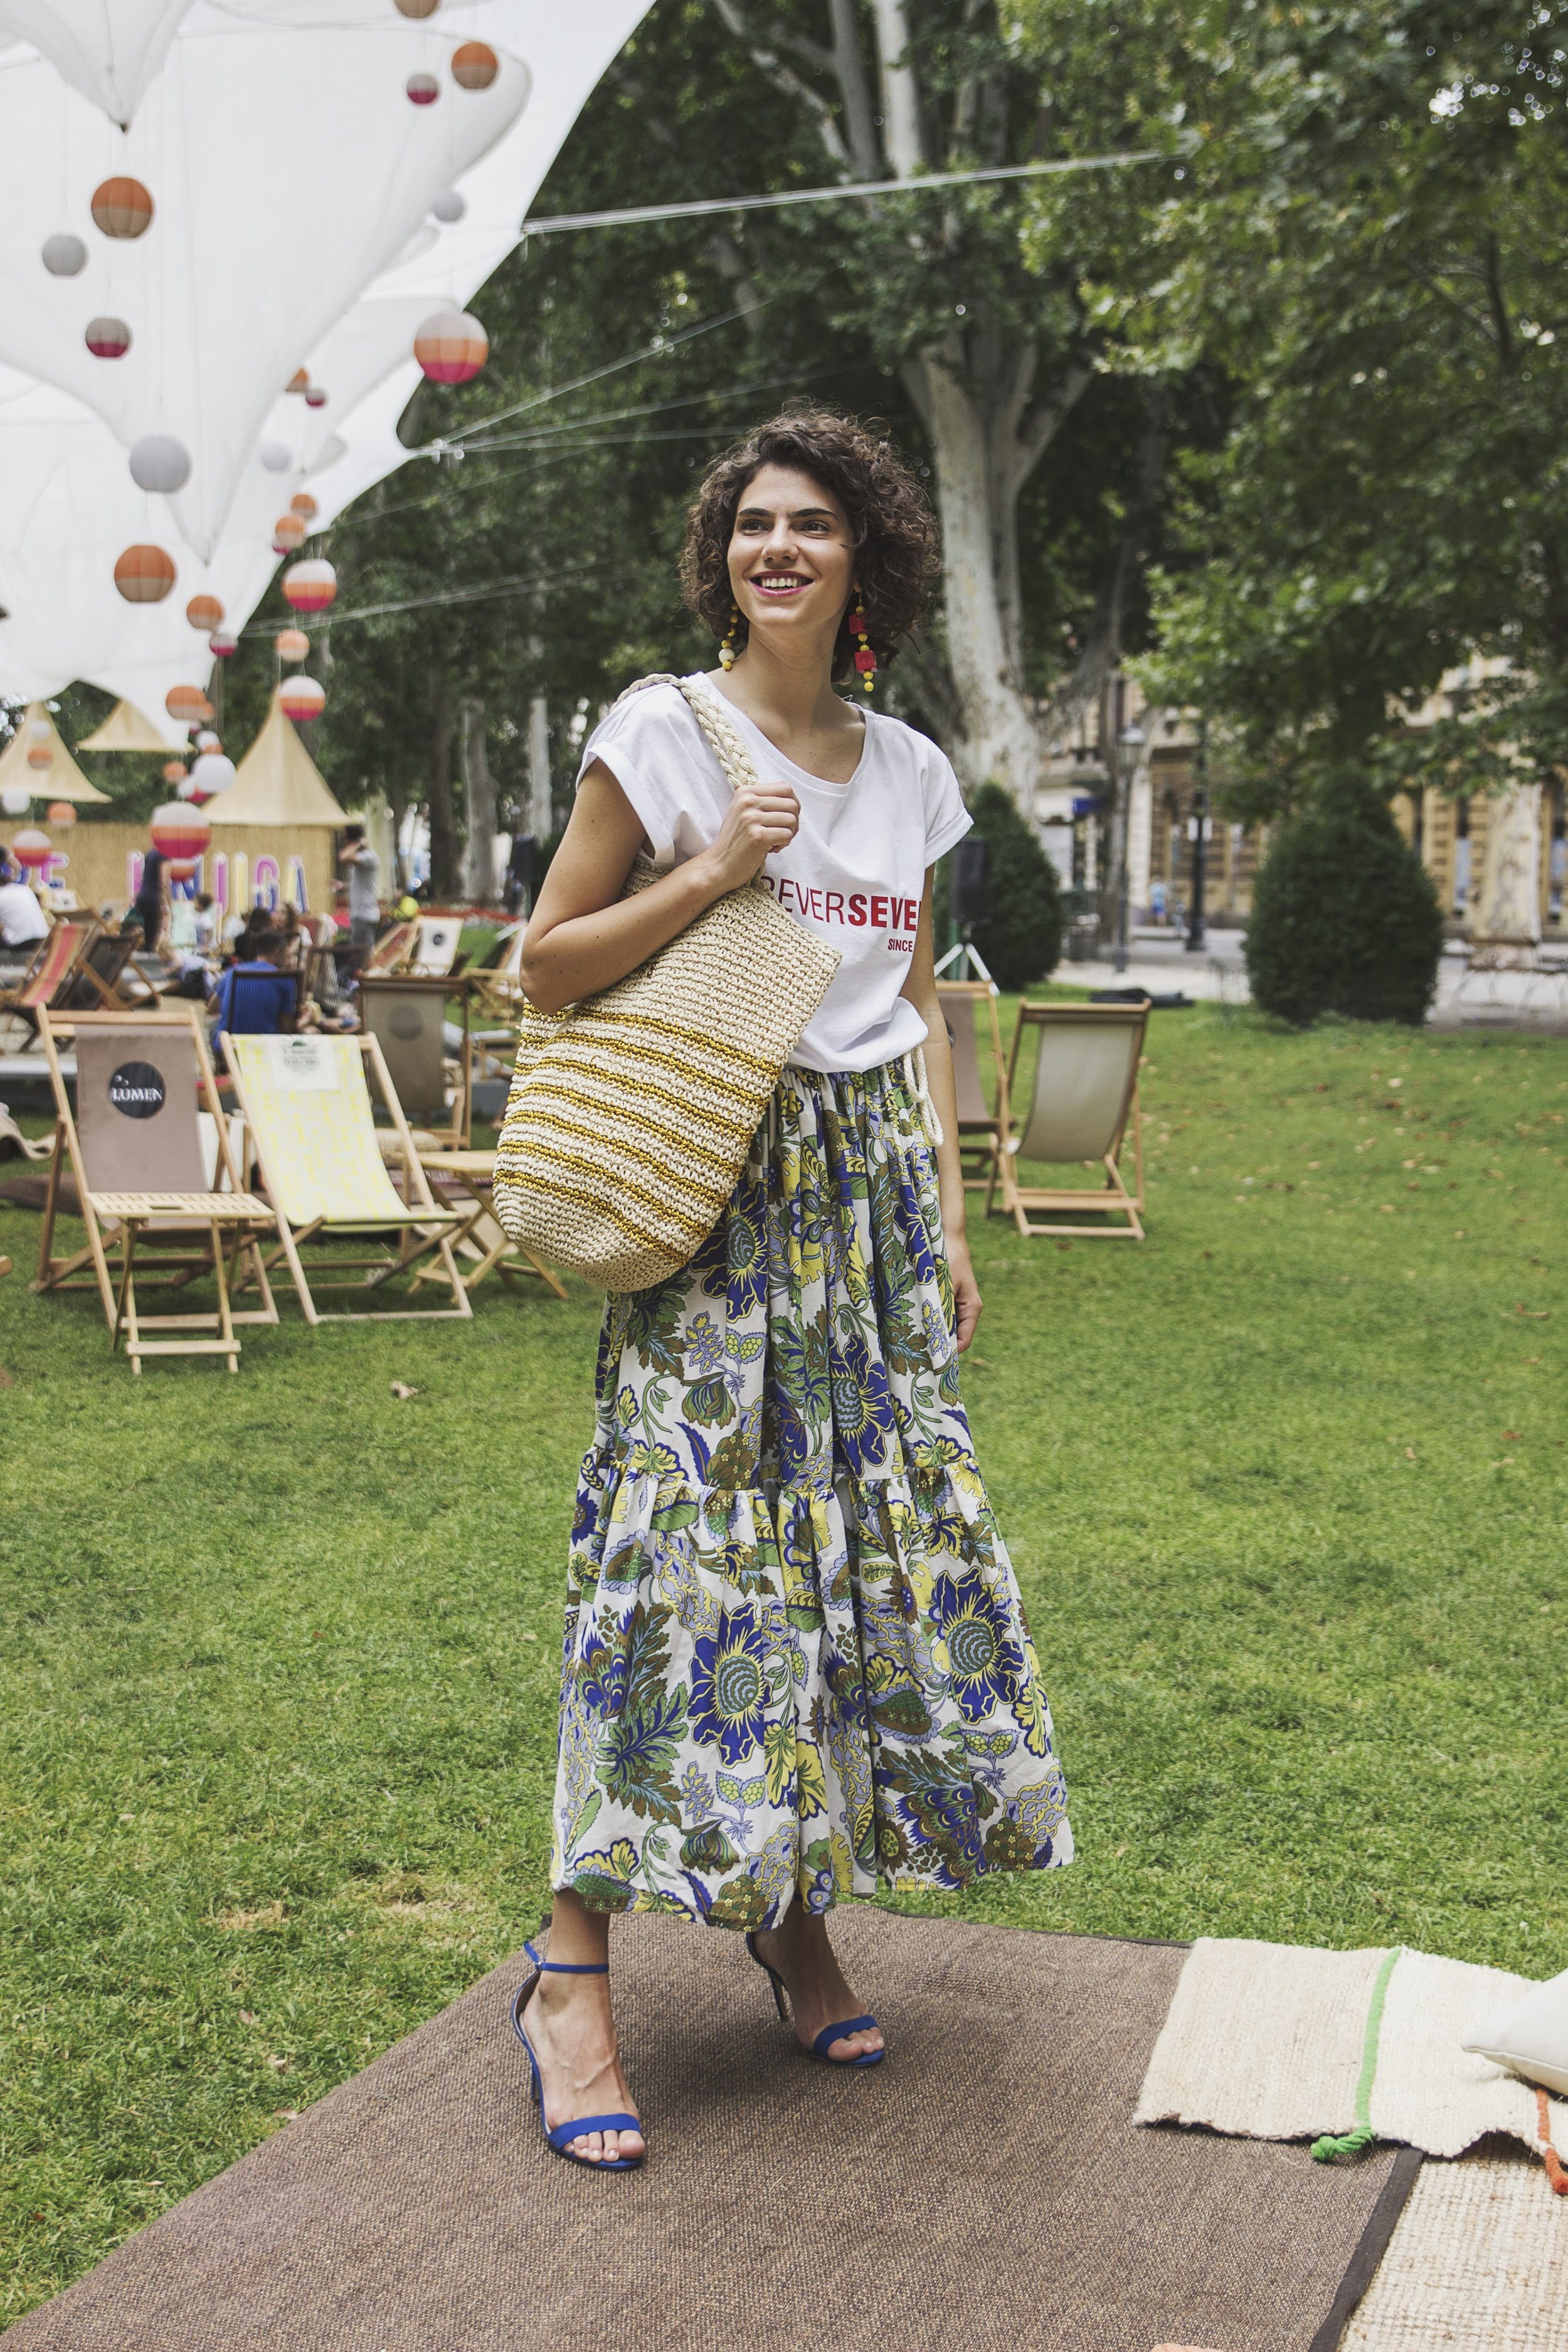 luka-lajic-fashion-photography-robert-sever-dizajner-croatian (22).jpg